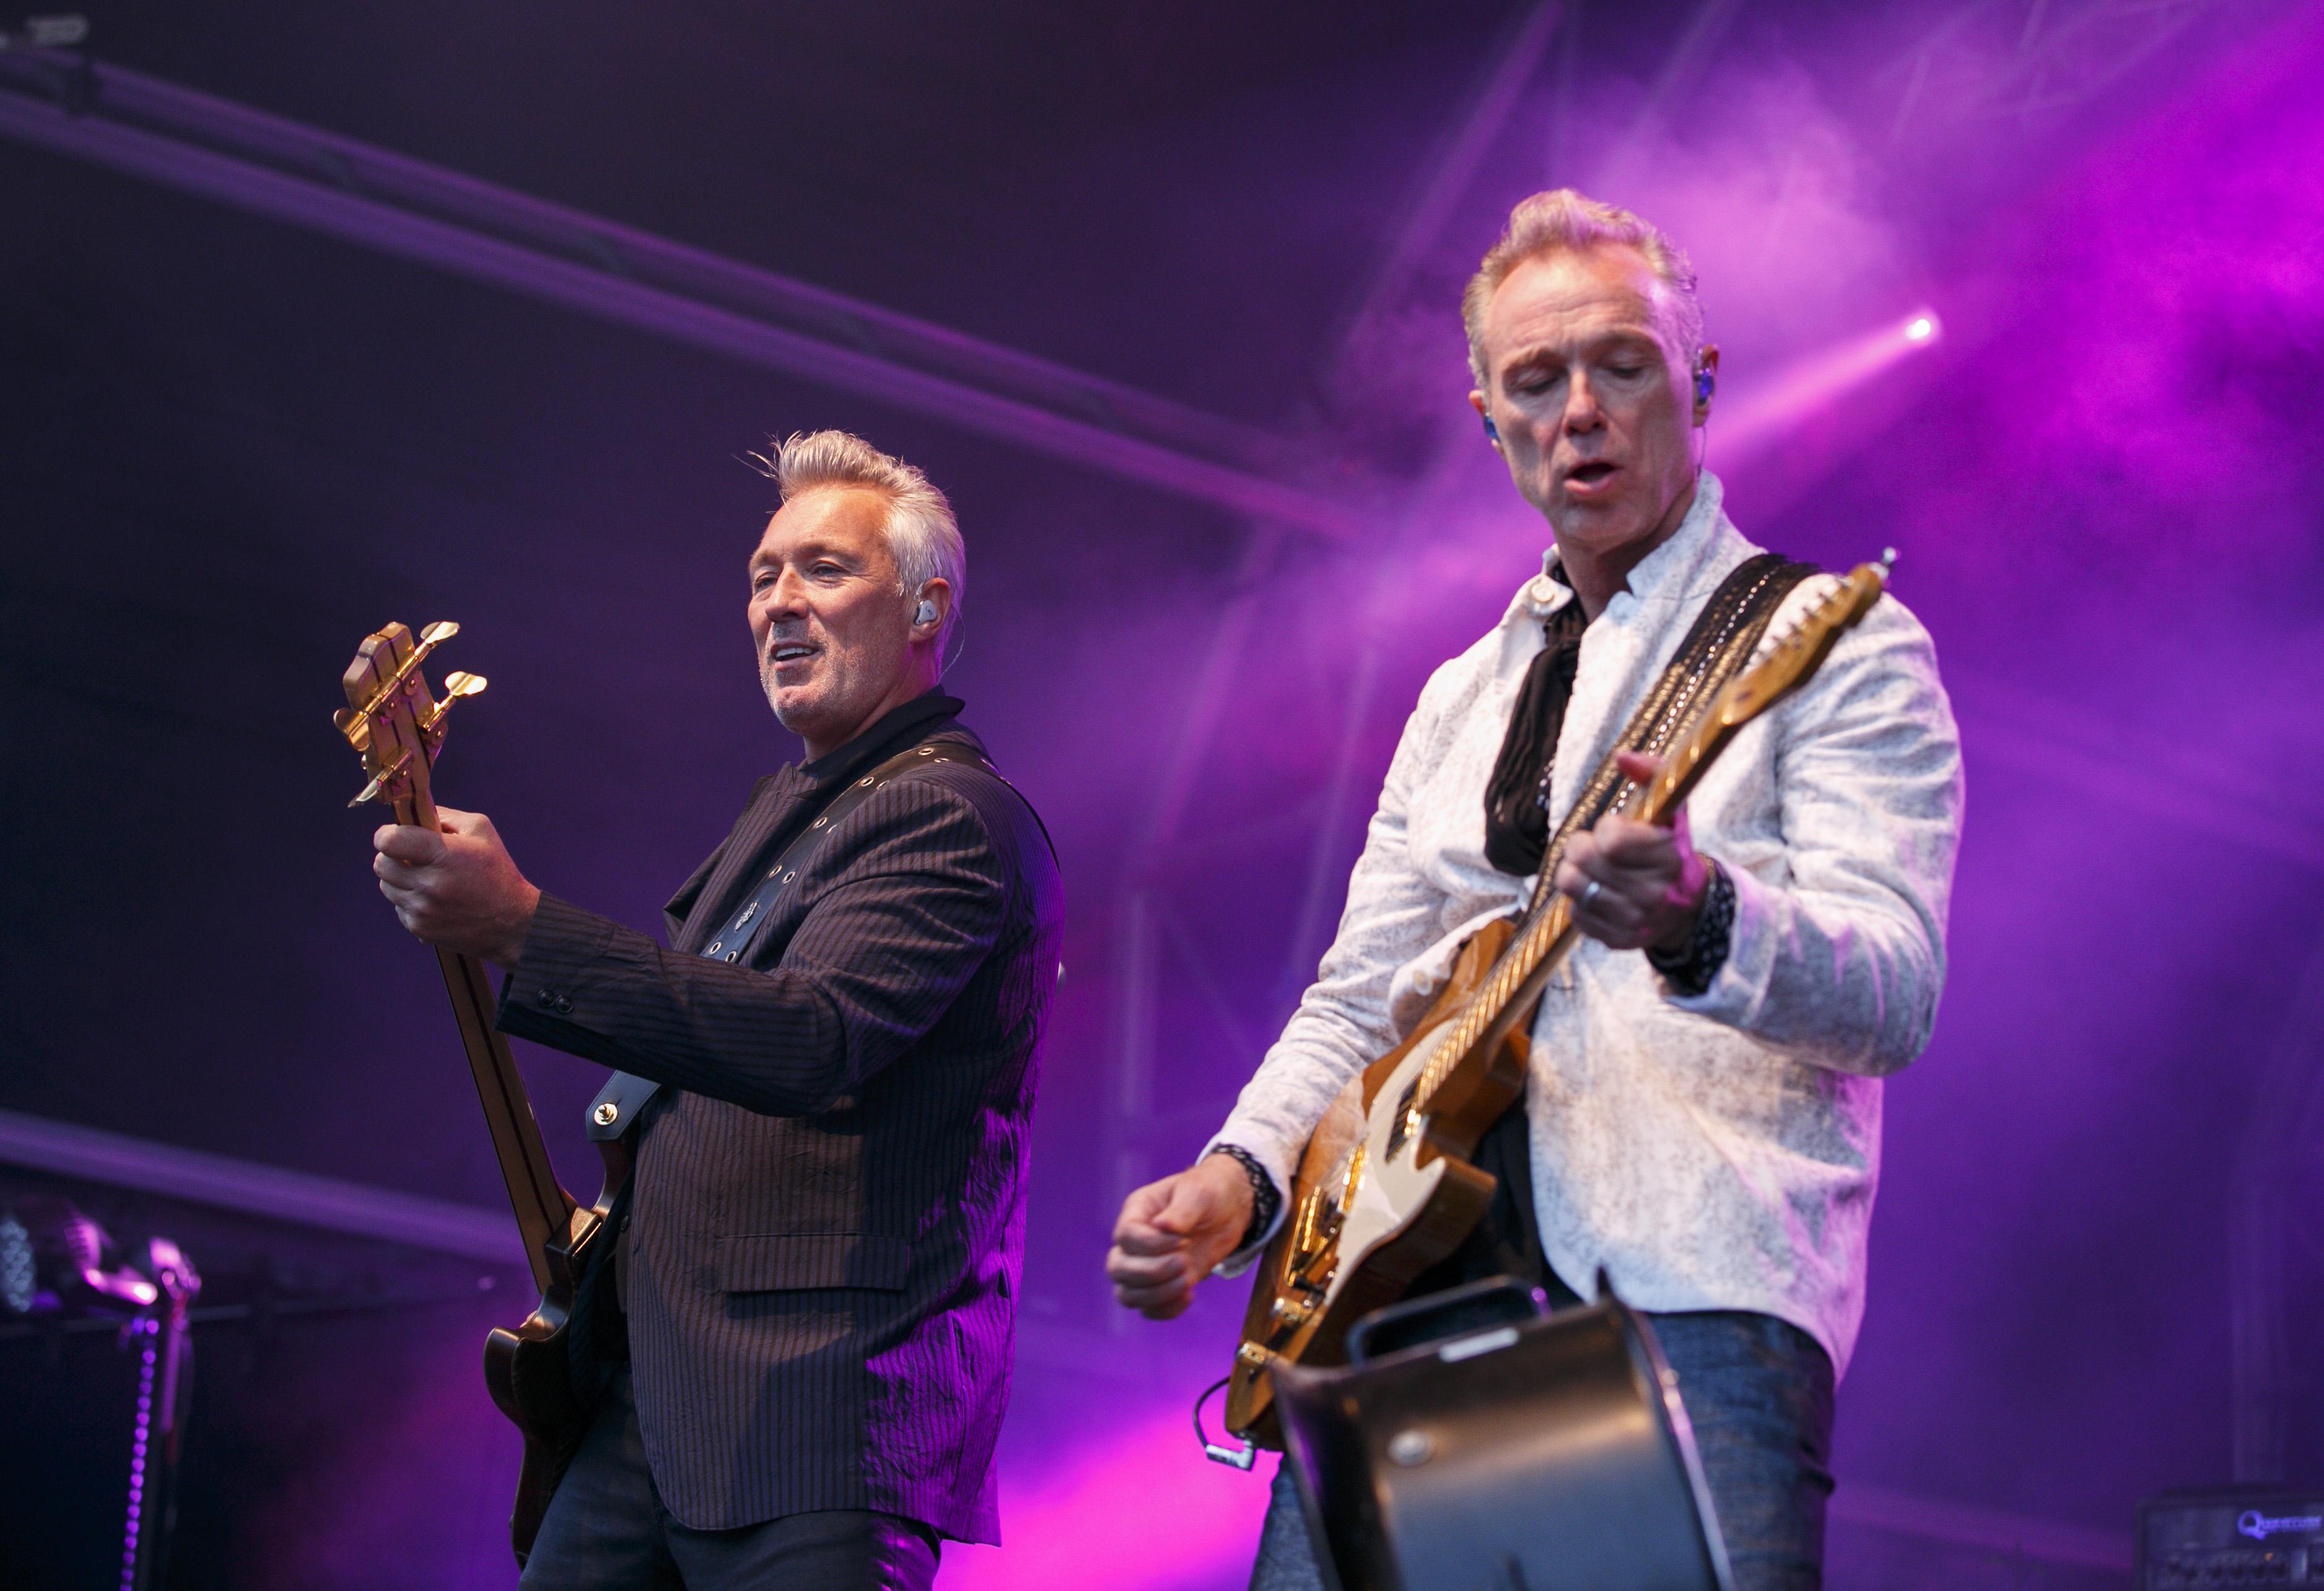 Martin and Gary Kemp